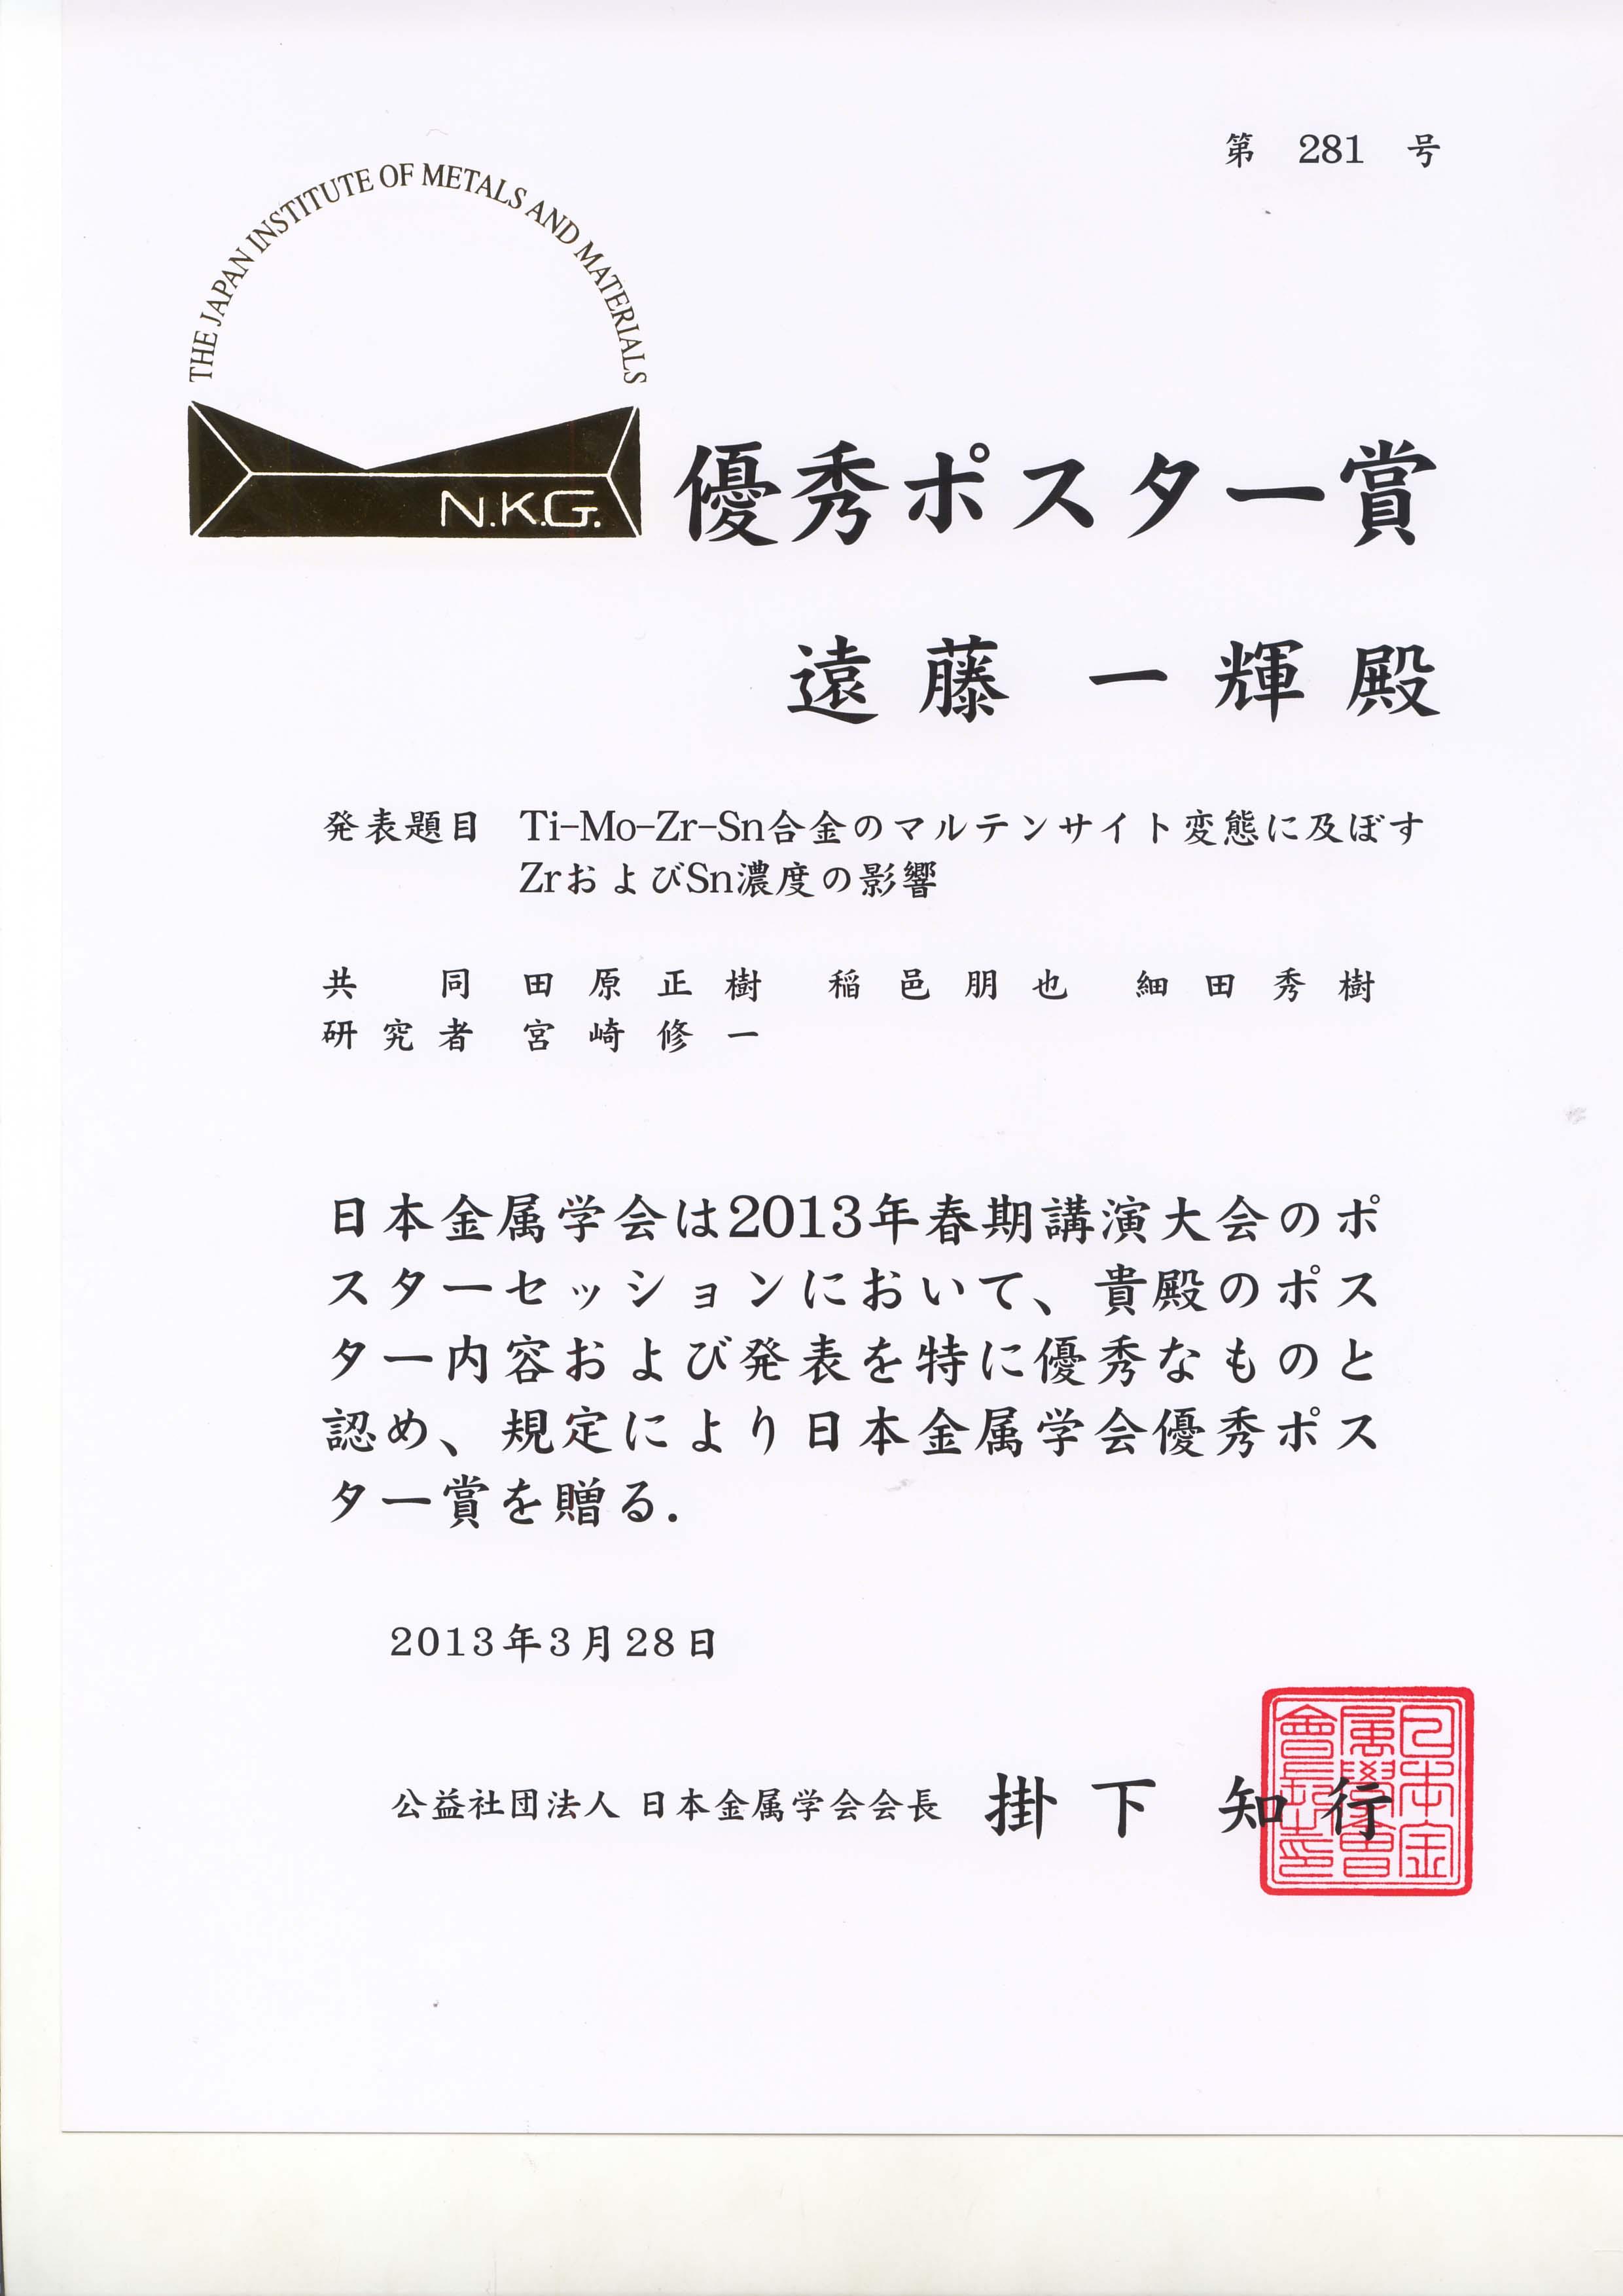 award2013_25.jpg